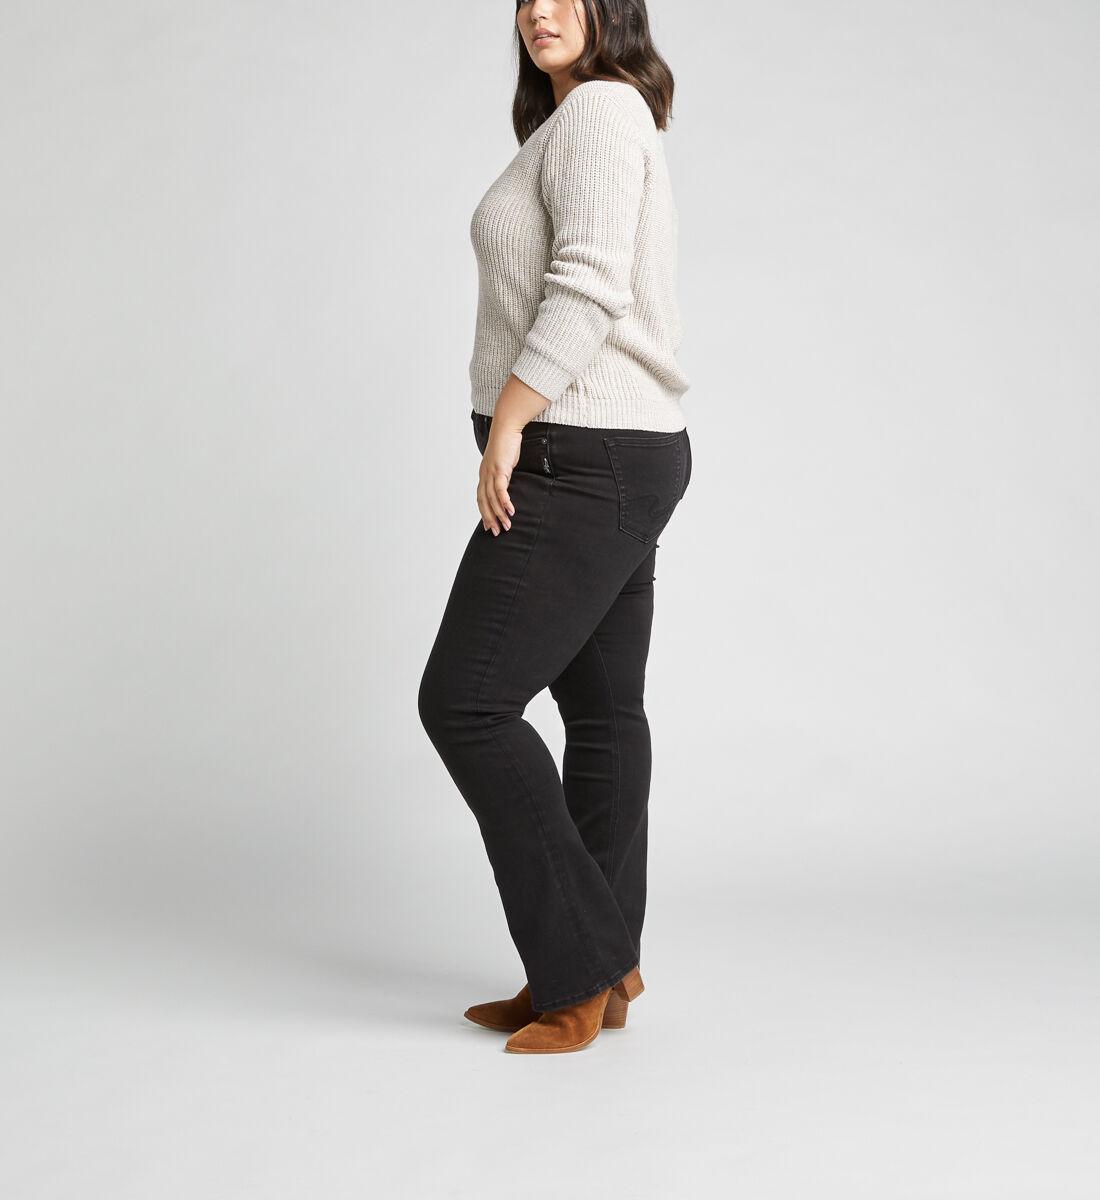 Suki Mid Rise Slim Bootcut Jeans Plus Size,Black Side